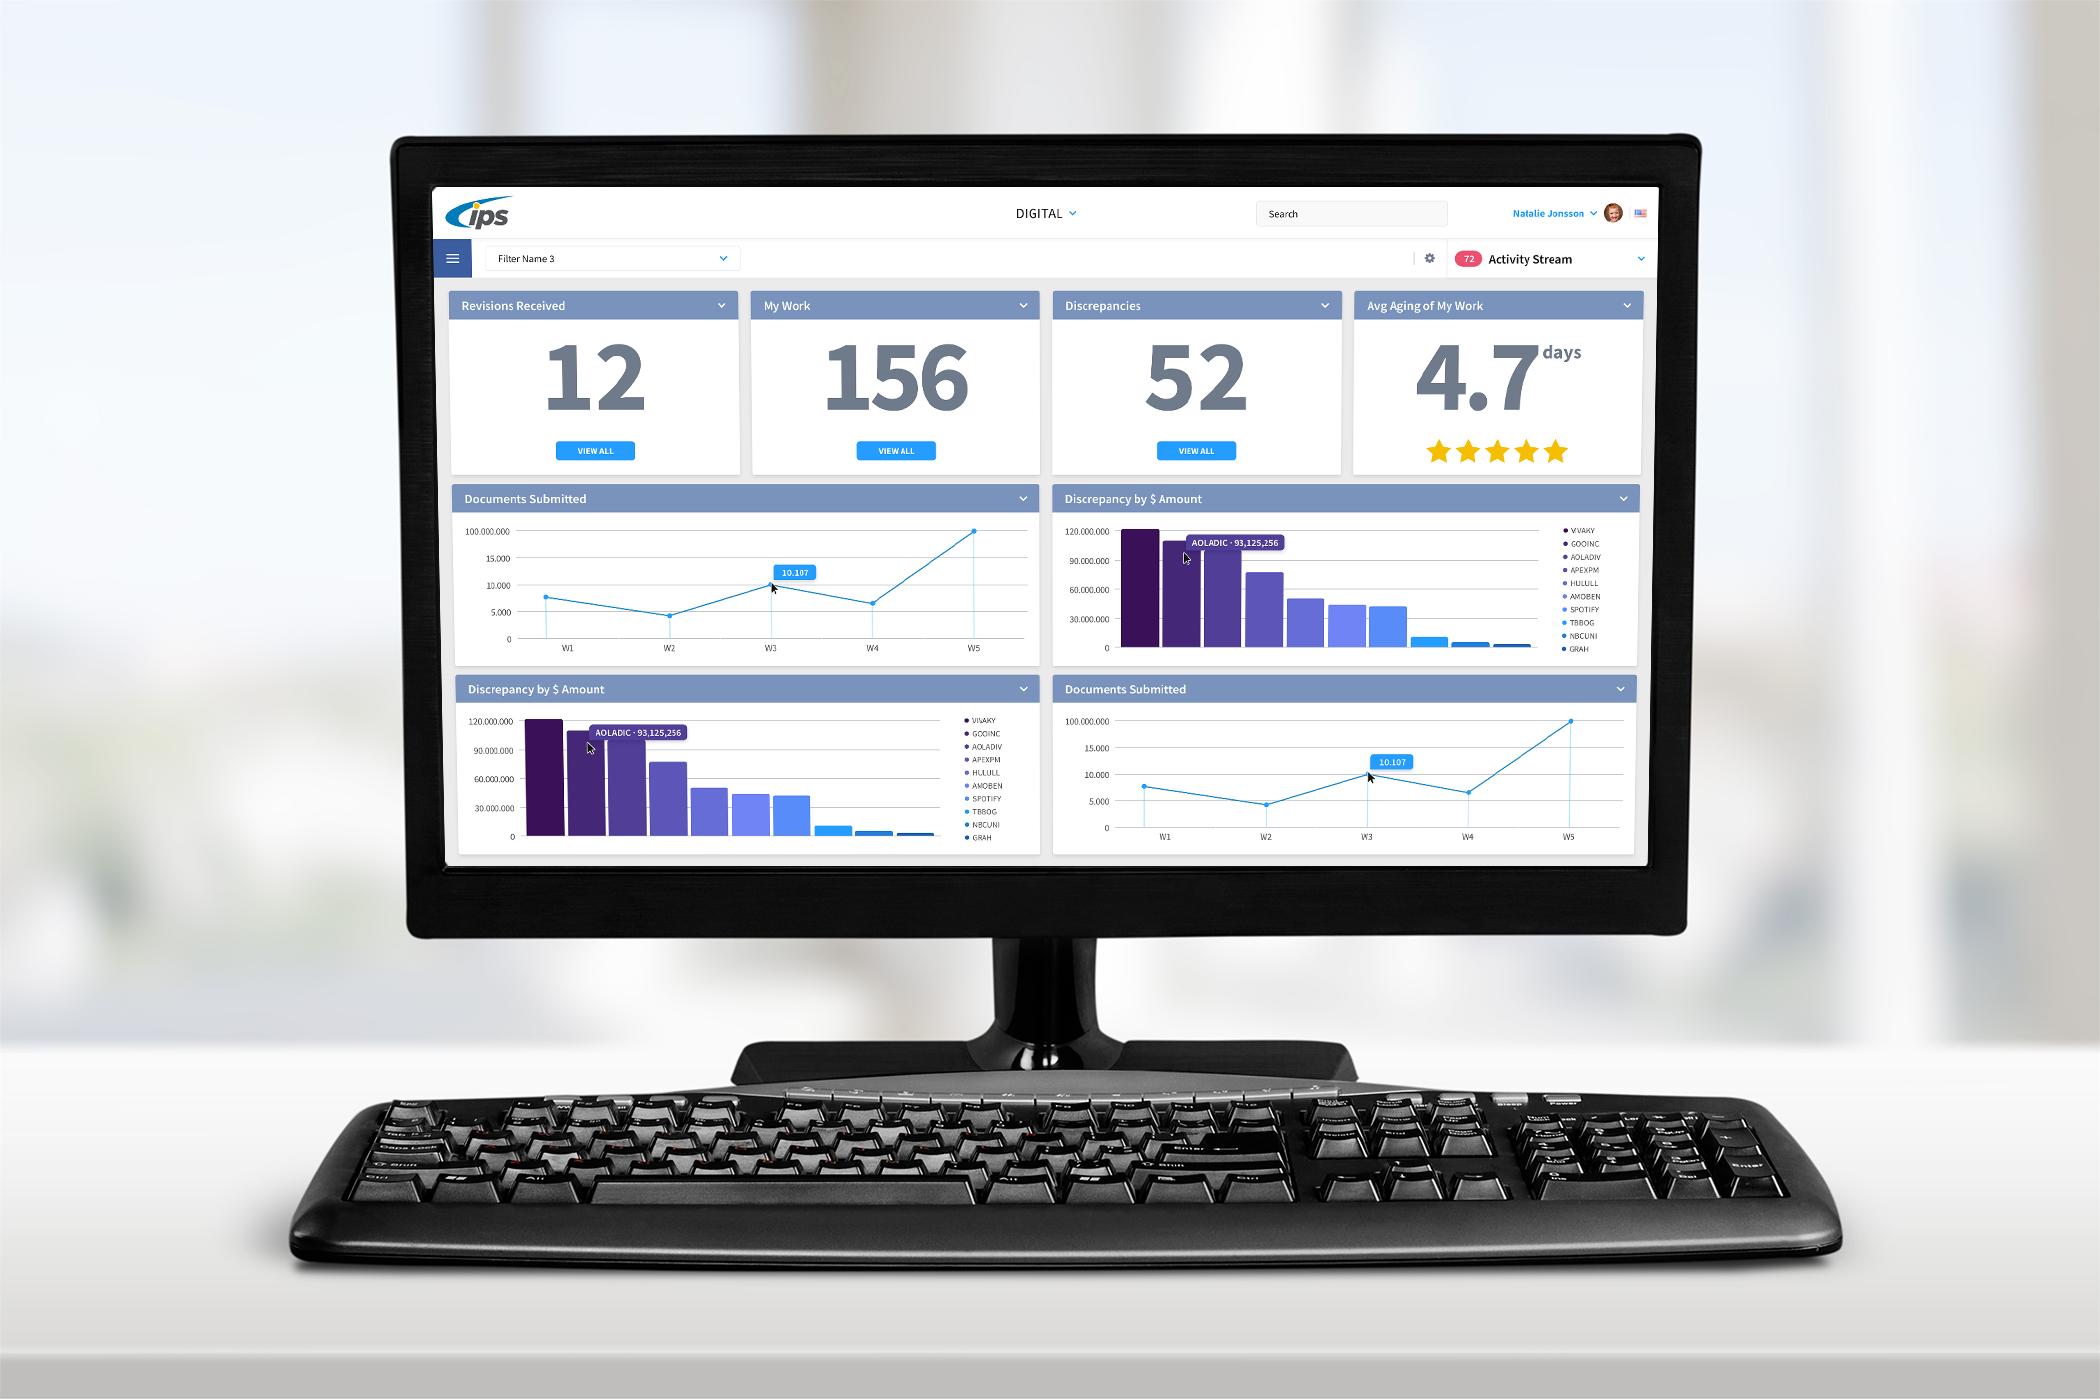 Productivity Wrx℠ for Accounts Payable Automation